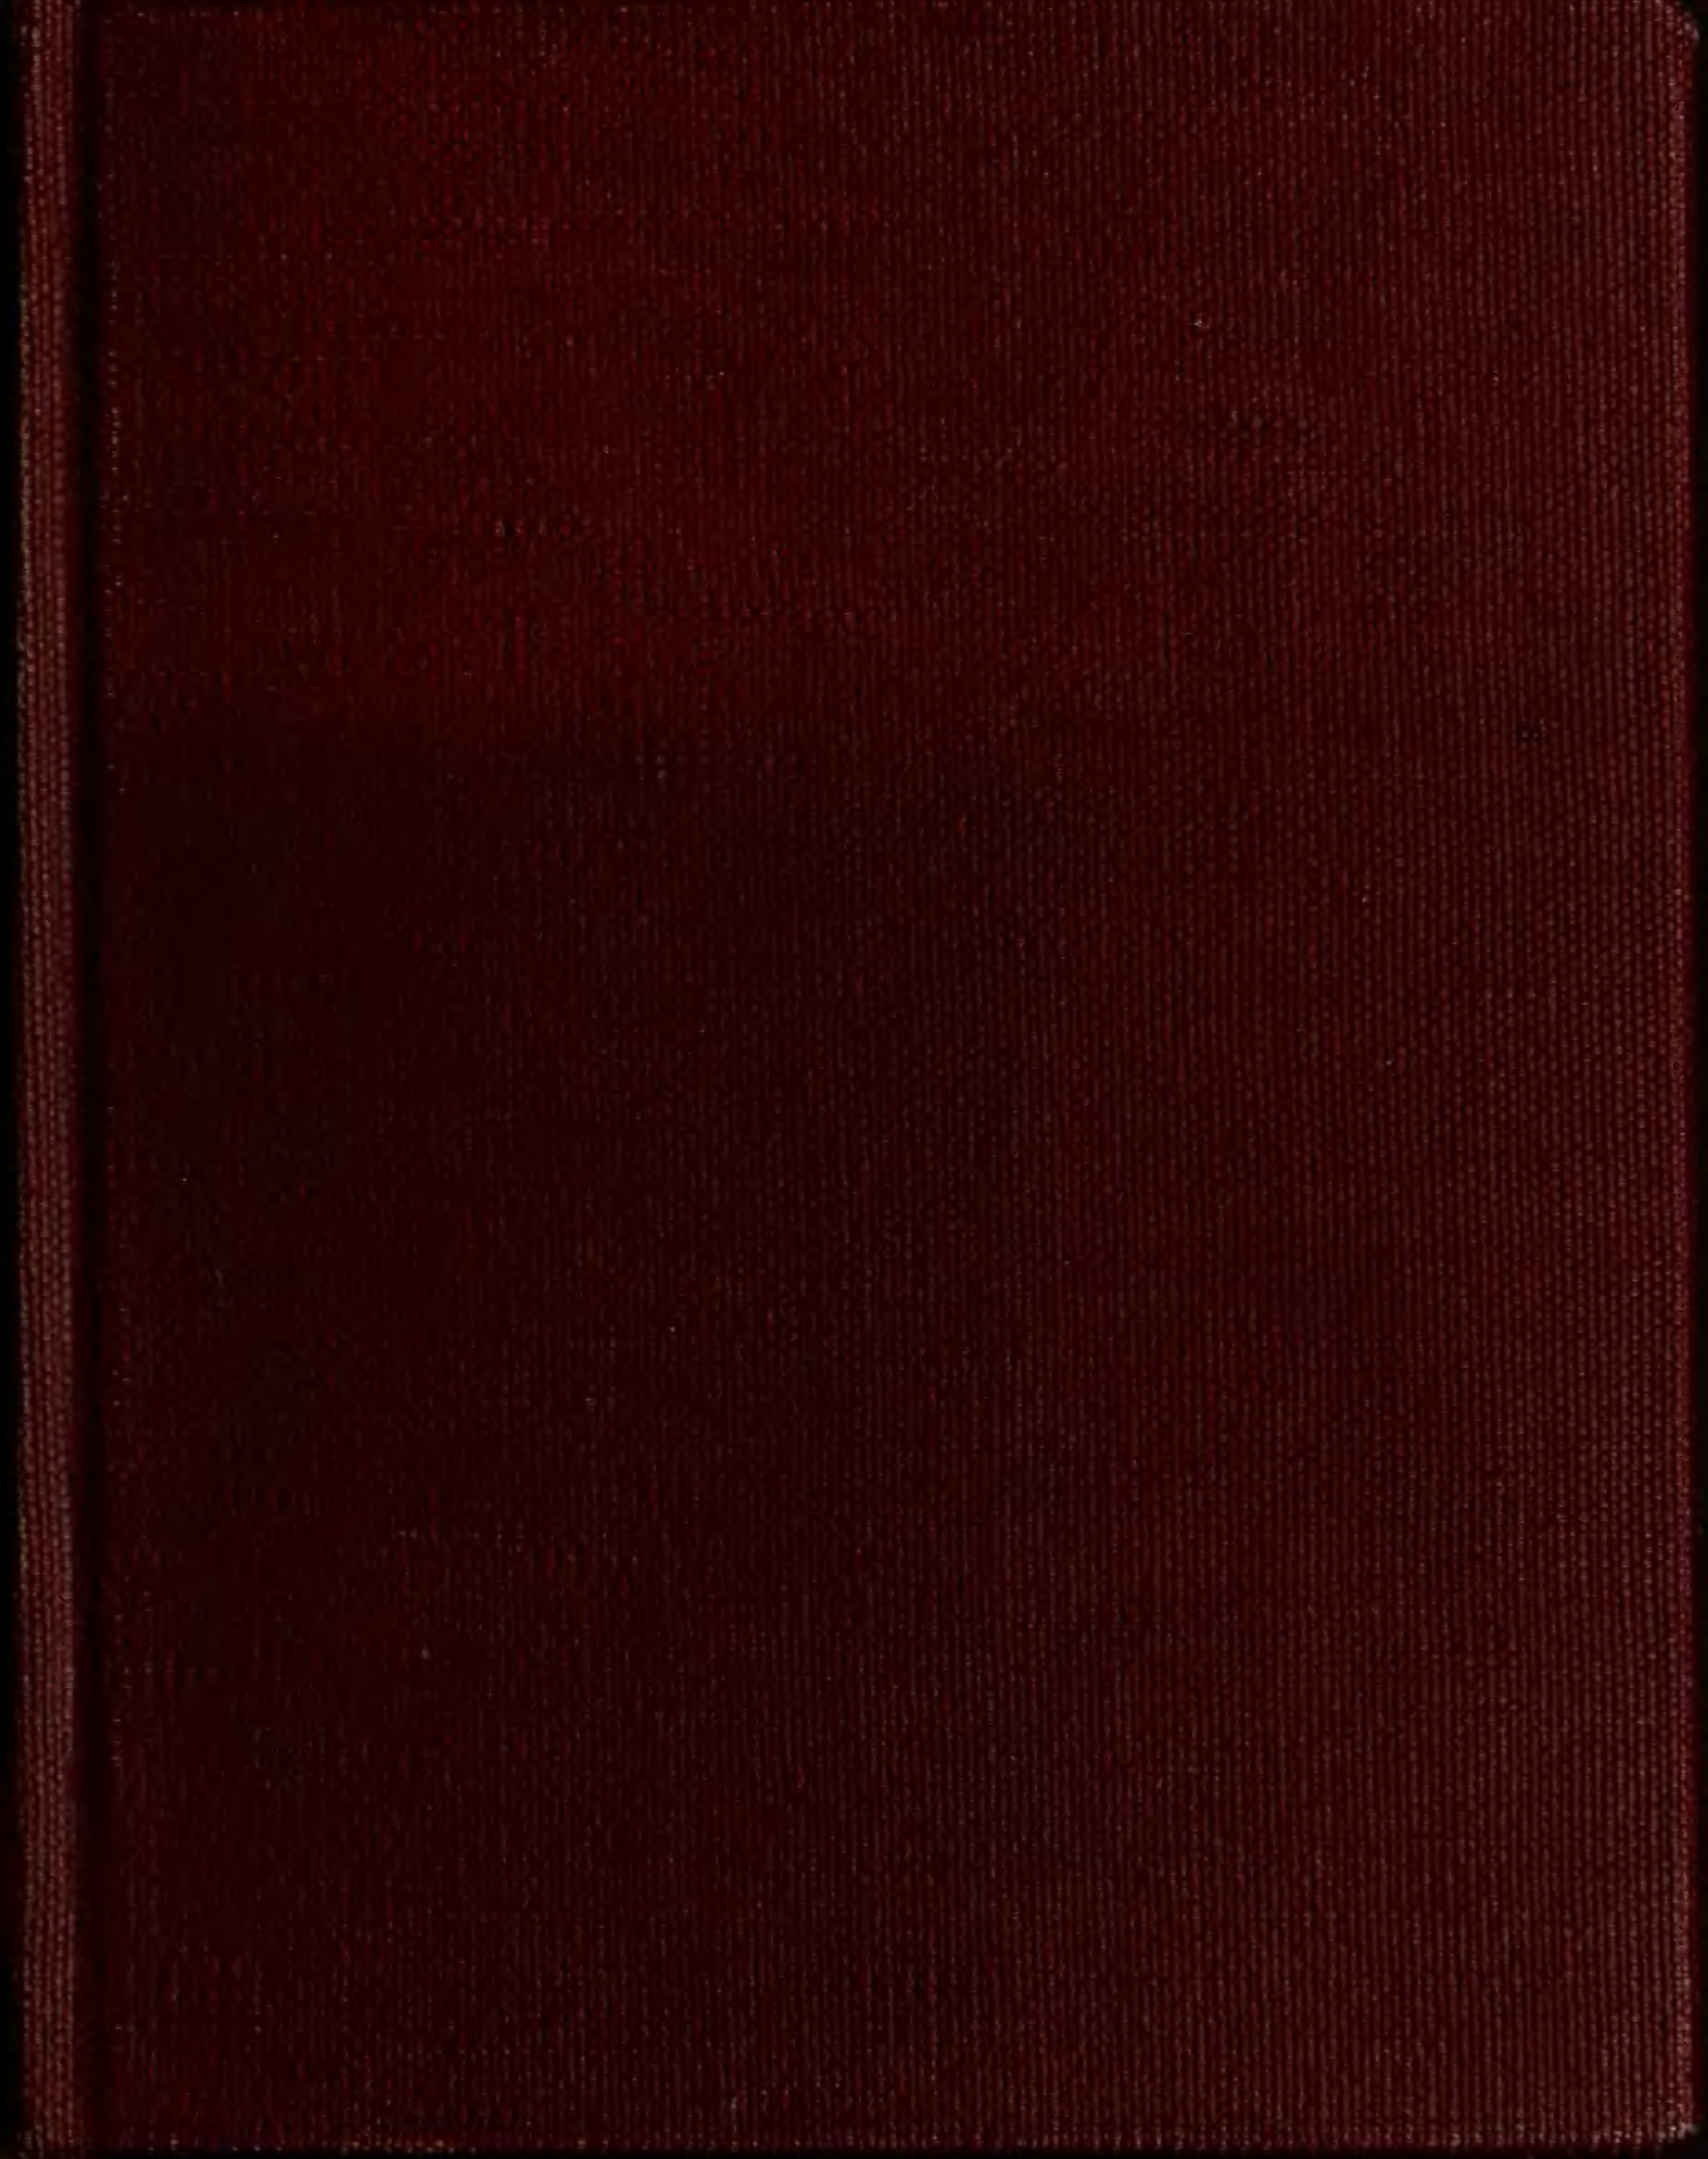 File:Telugu-English Dictionary djvu - Wikimedia Commons